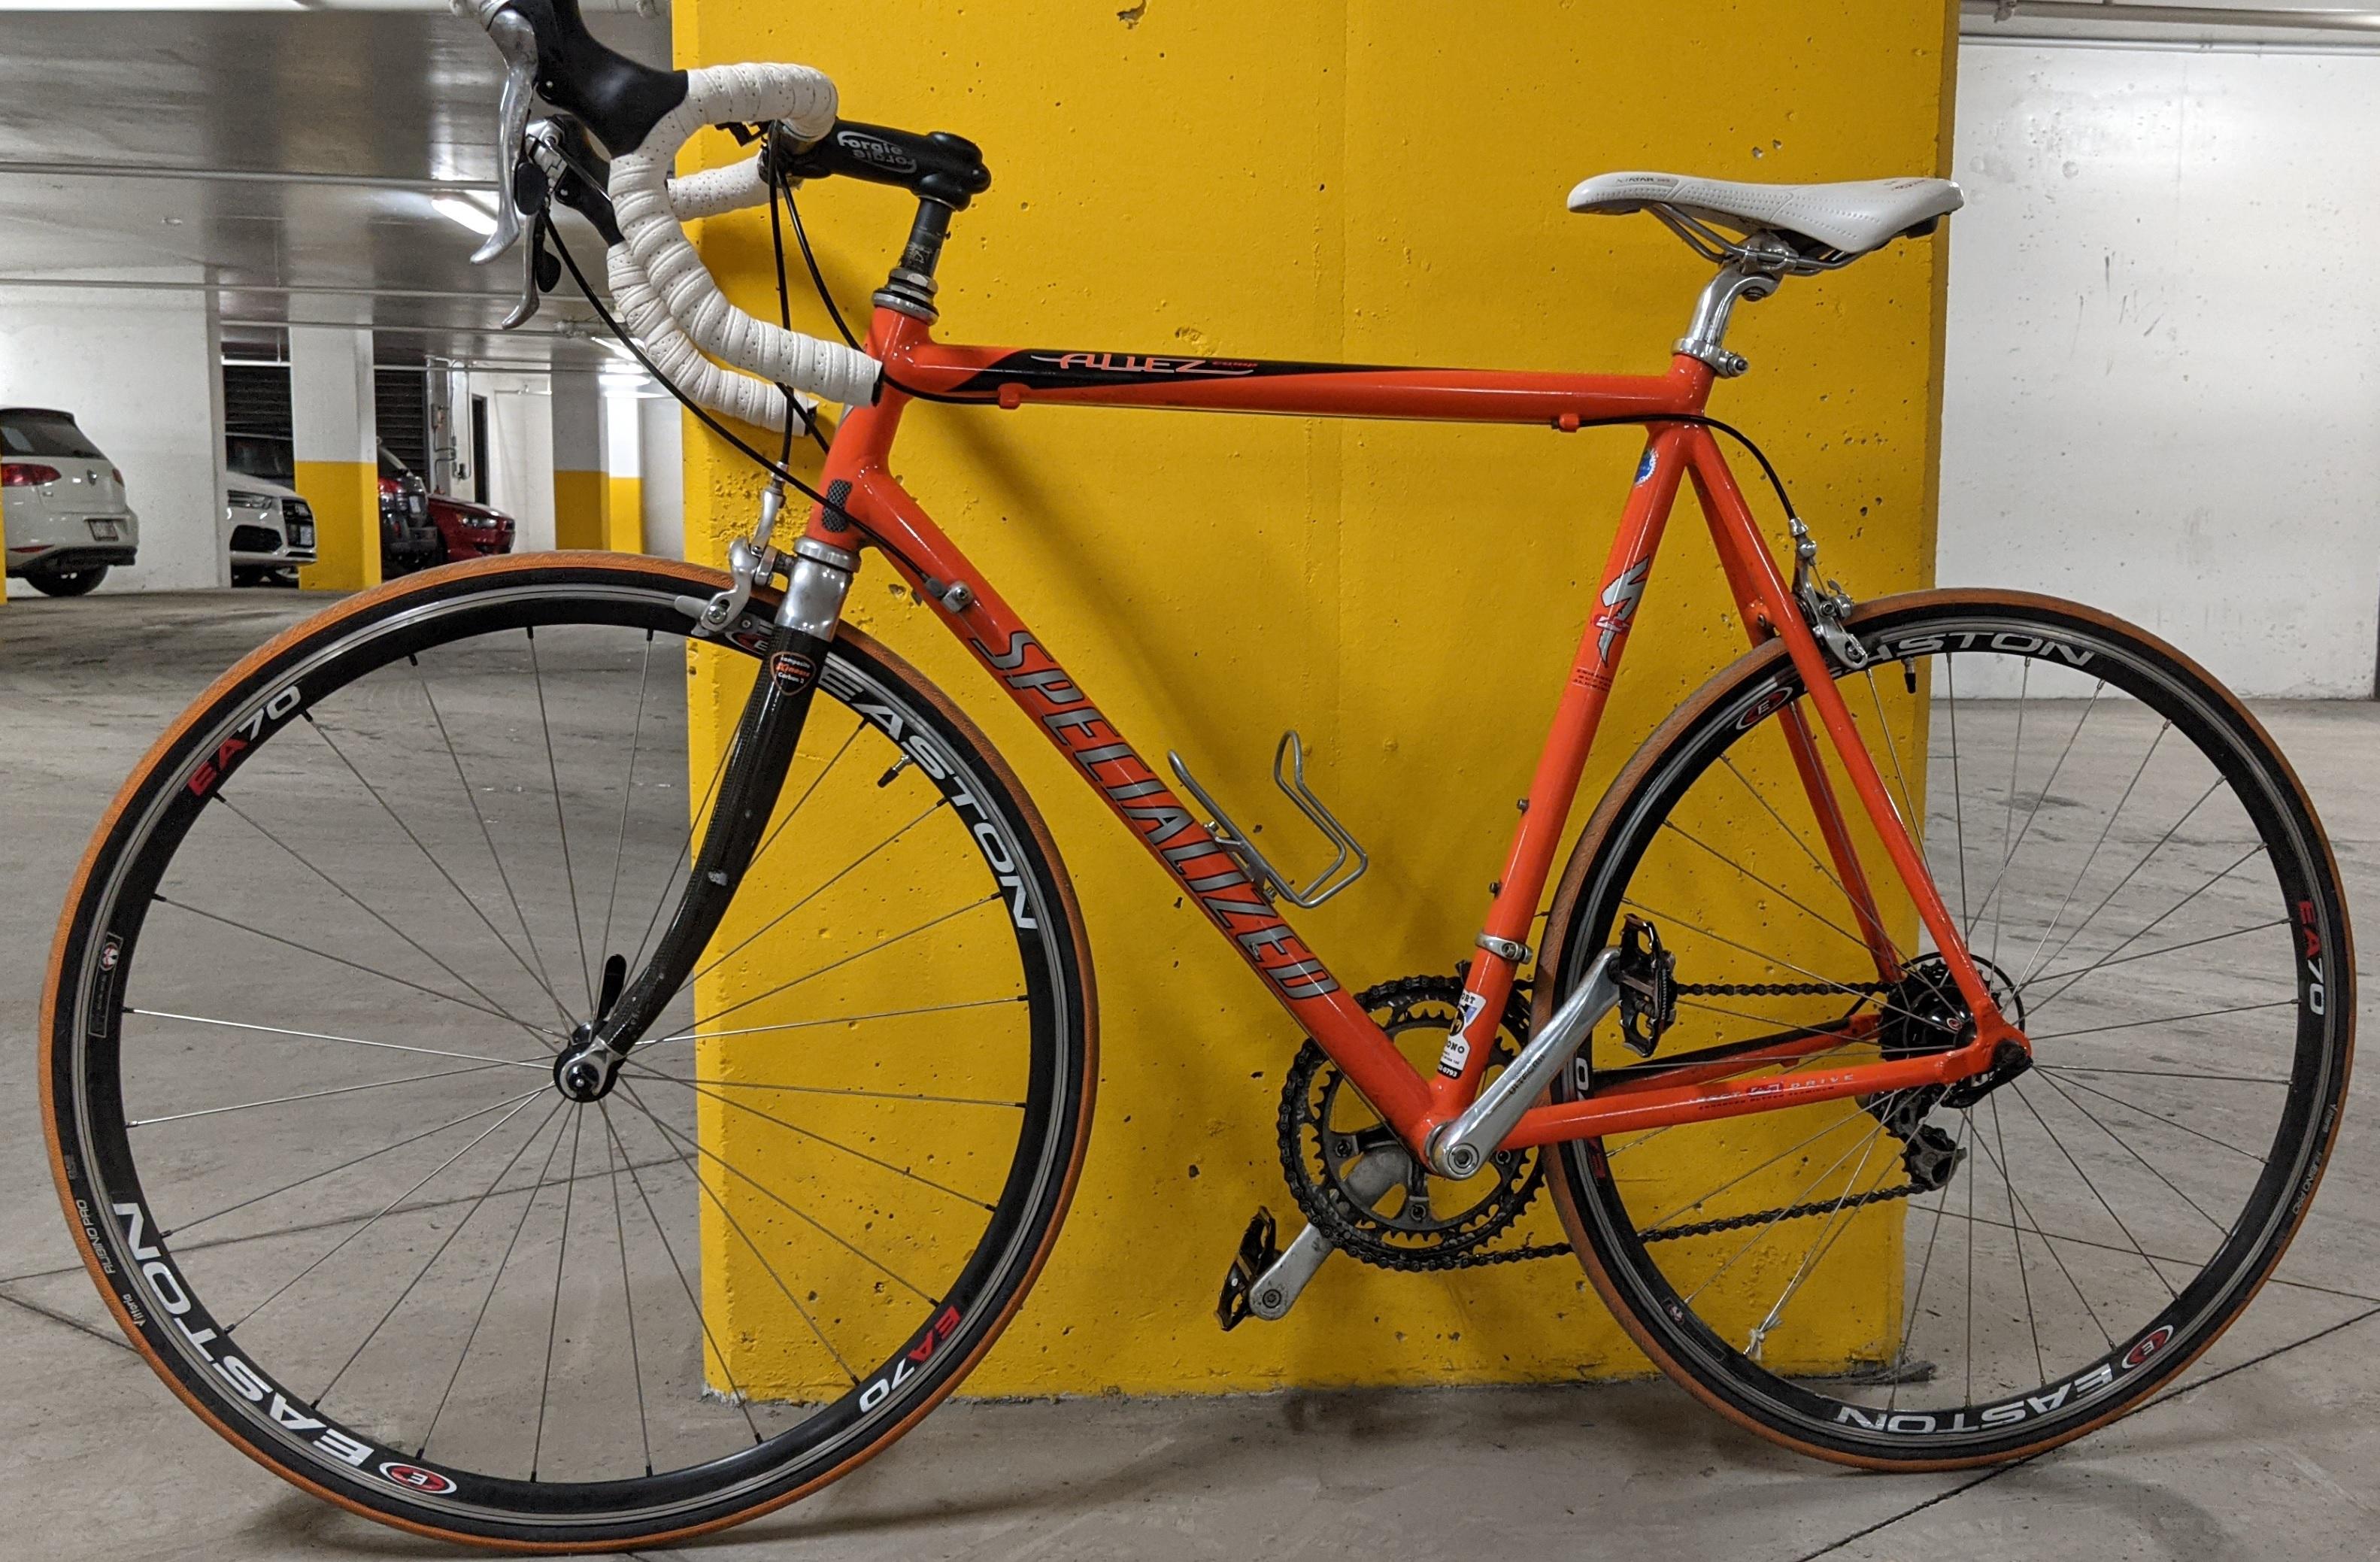 BV bike - Avid cyclist